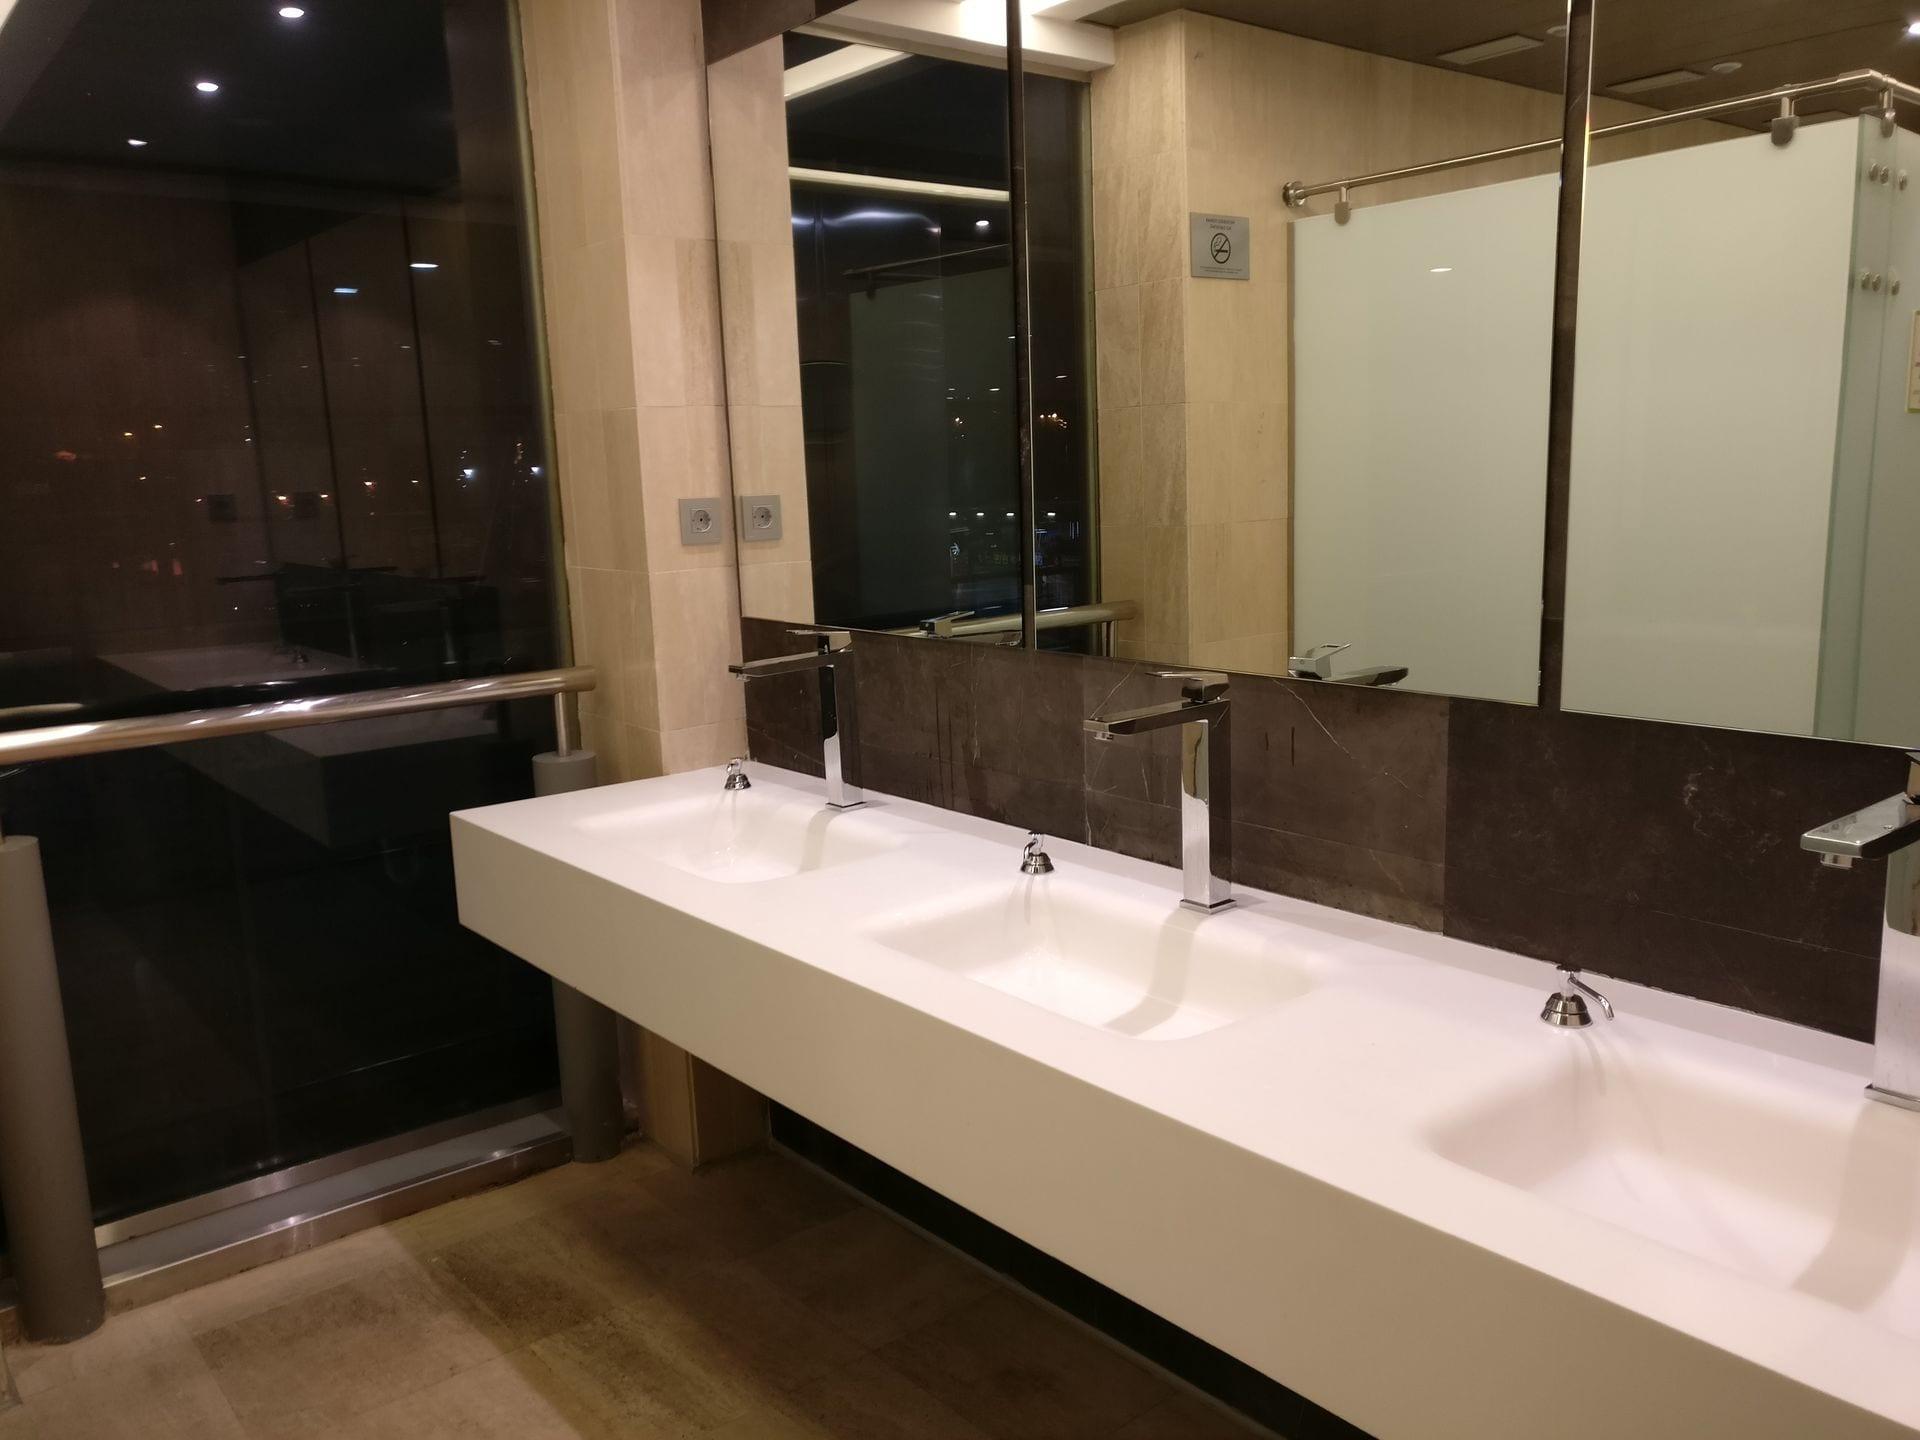 Puerta del sol lounge madrid lavatories for Puerta del sol 2017